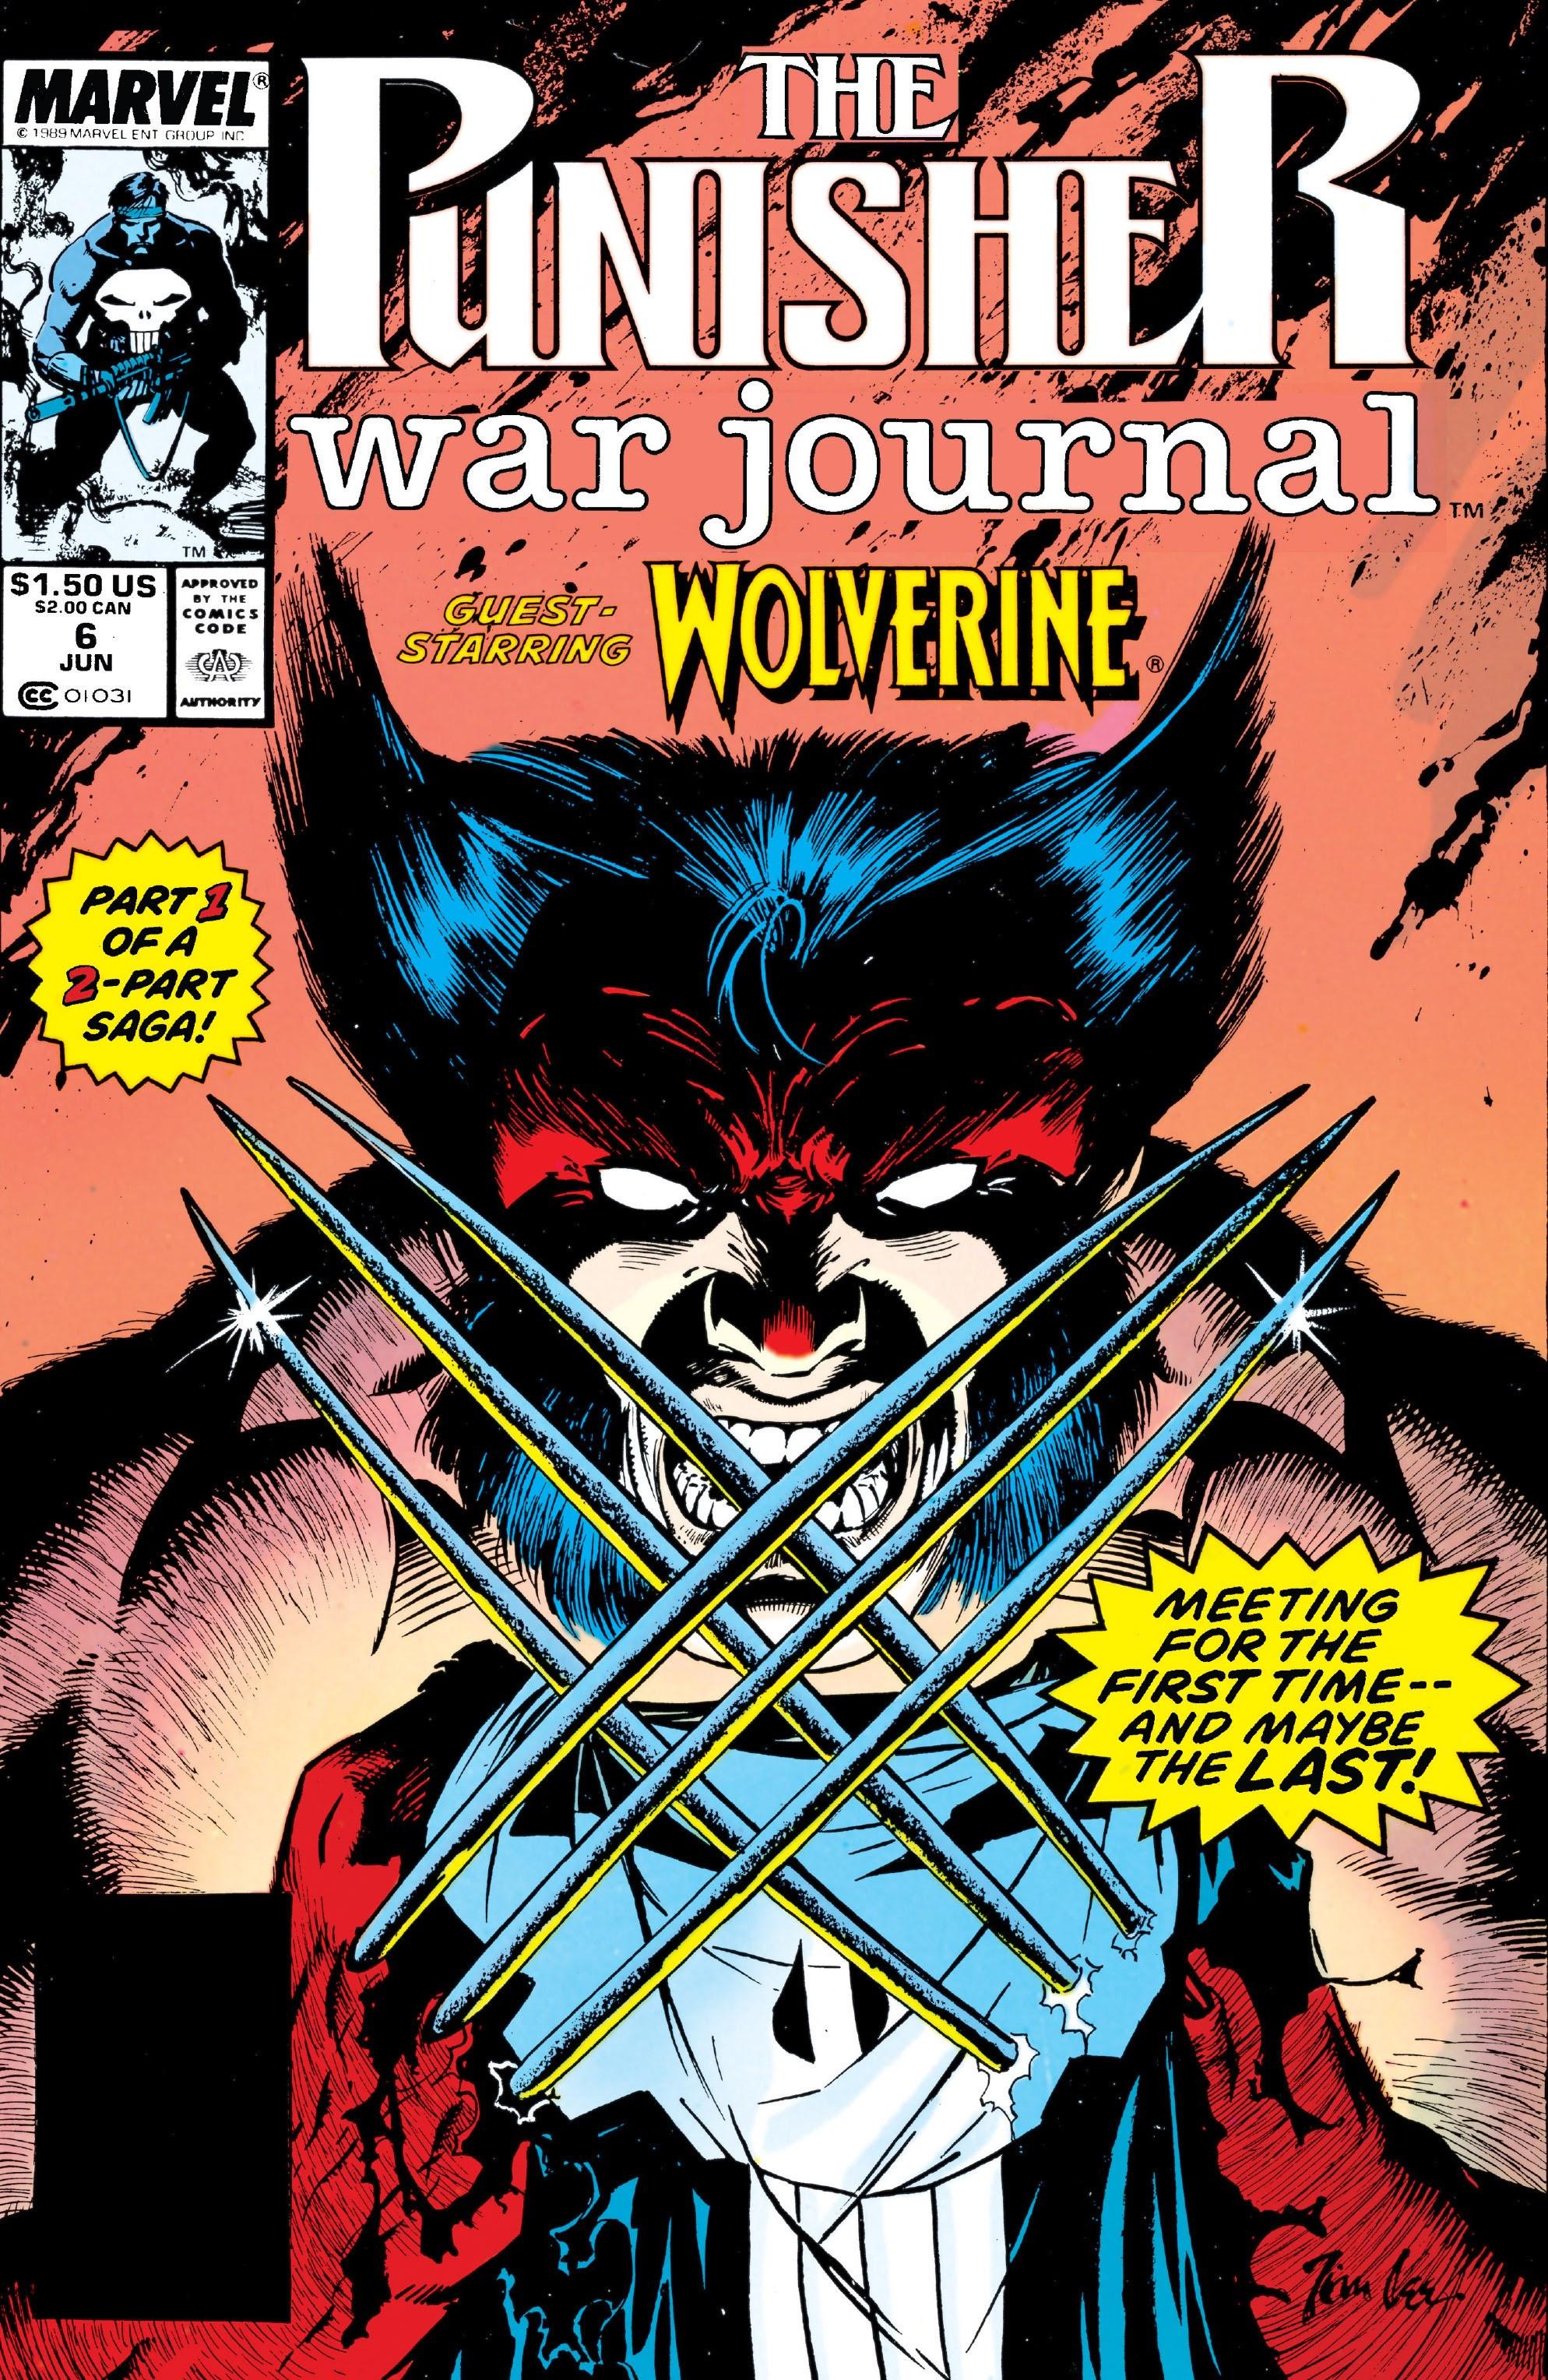 Punisher War Journal Vol 1 6 - Marvel Comics Database